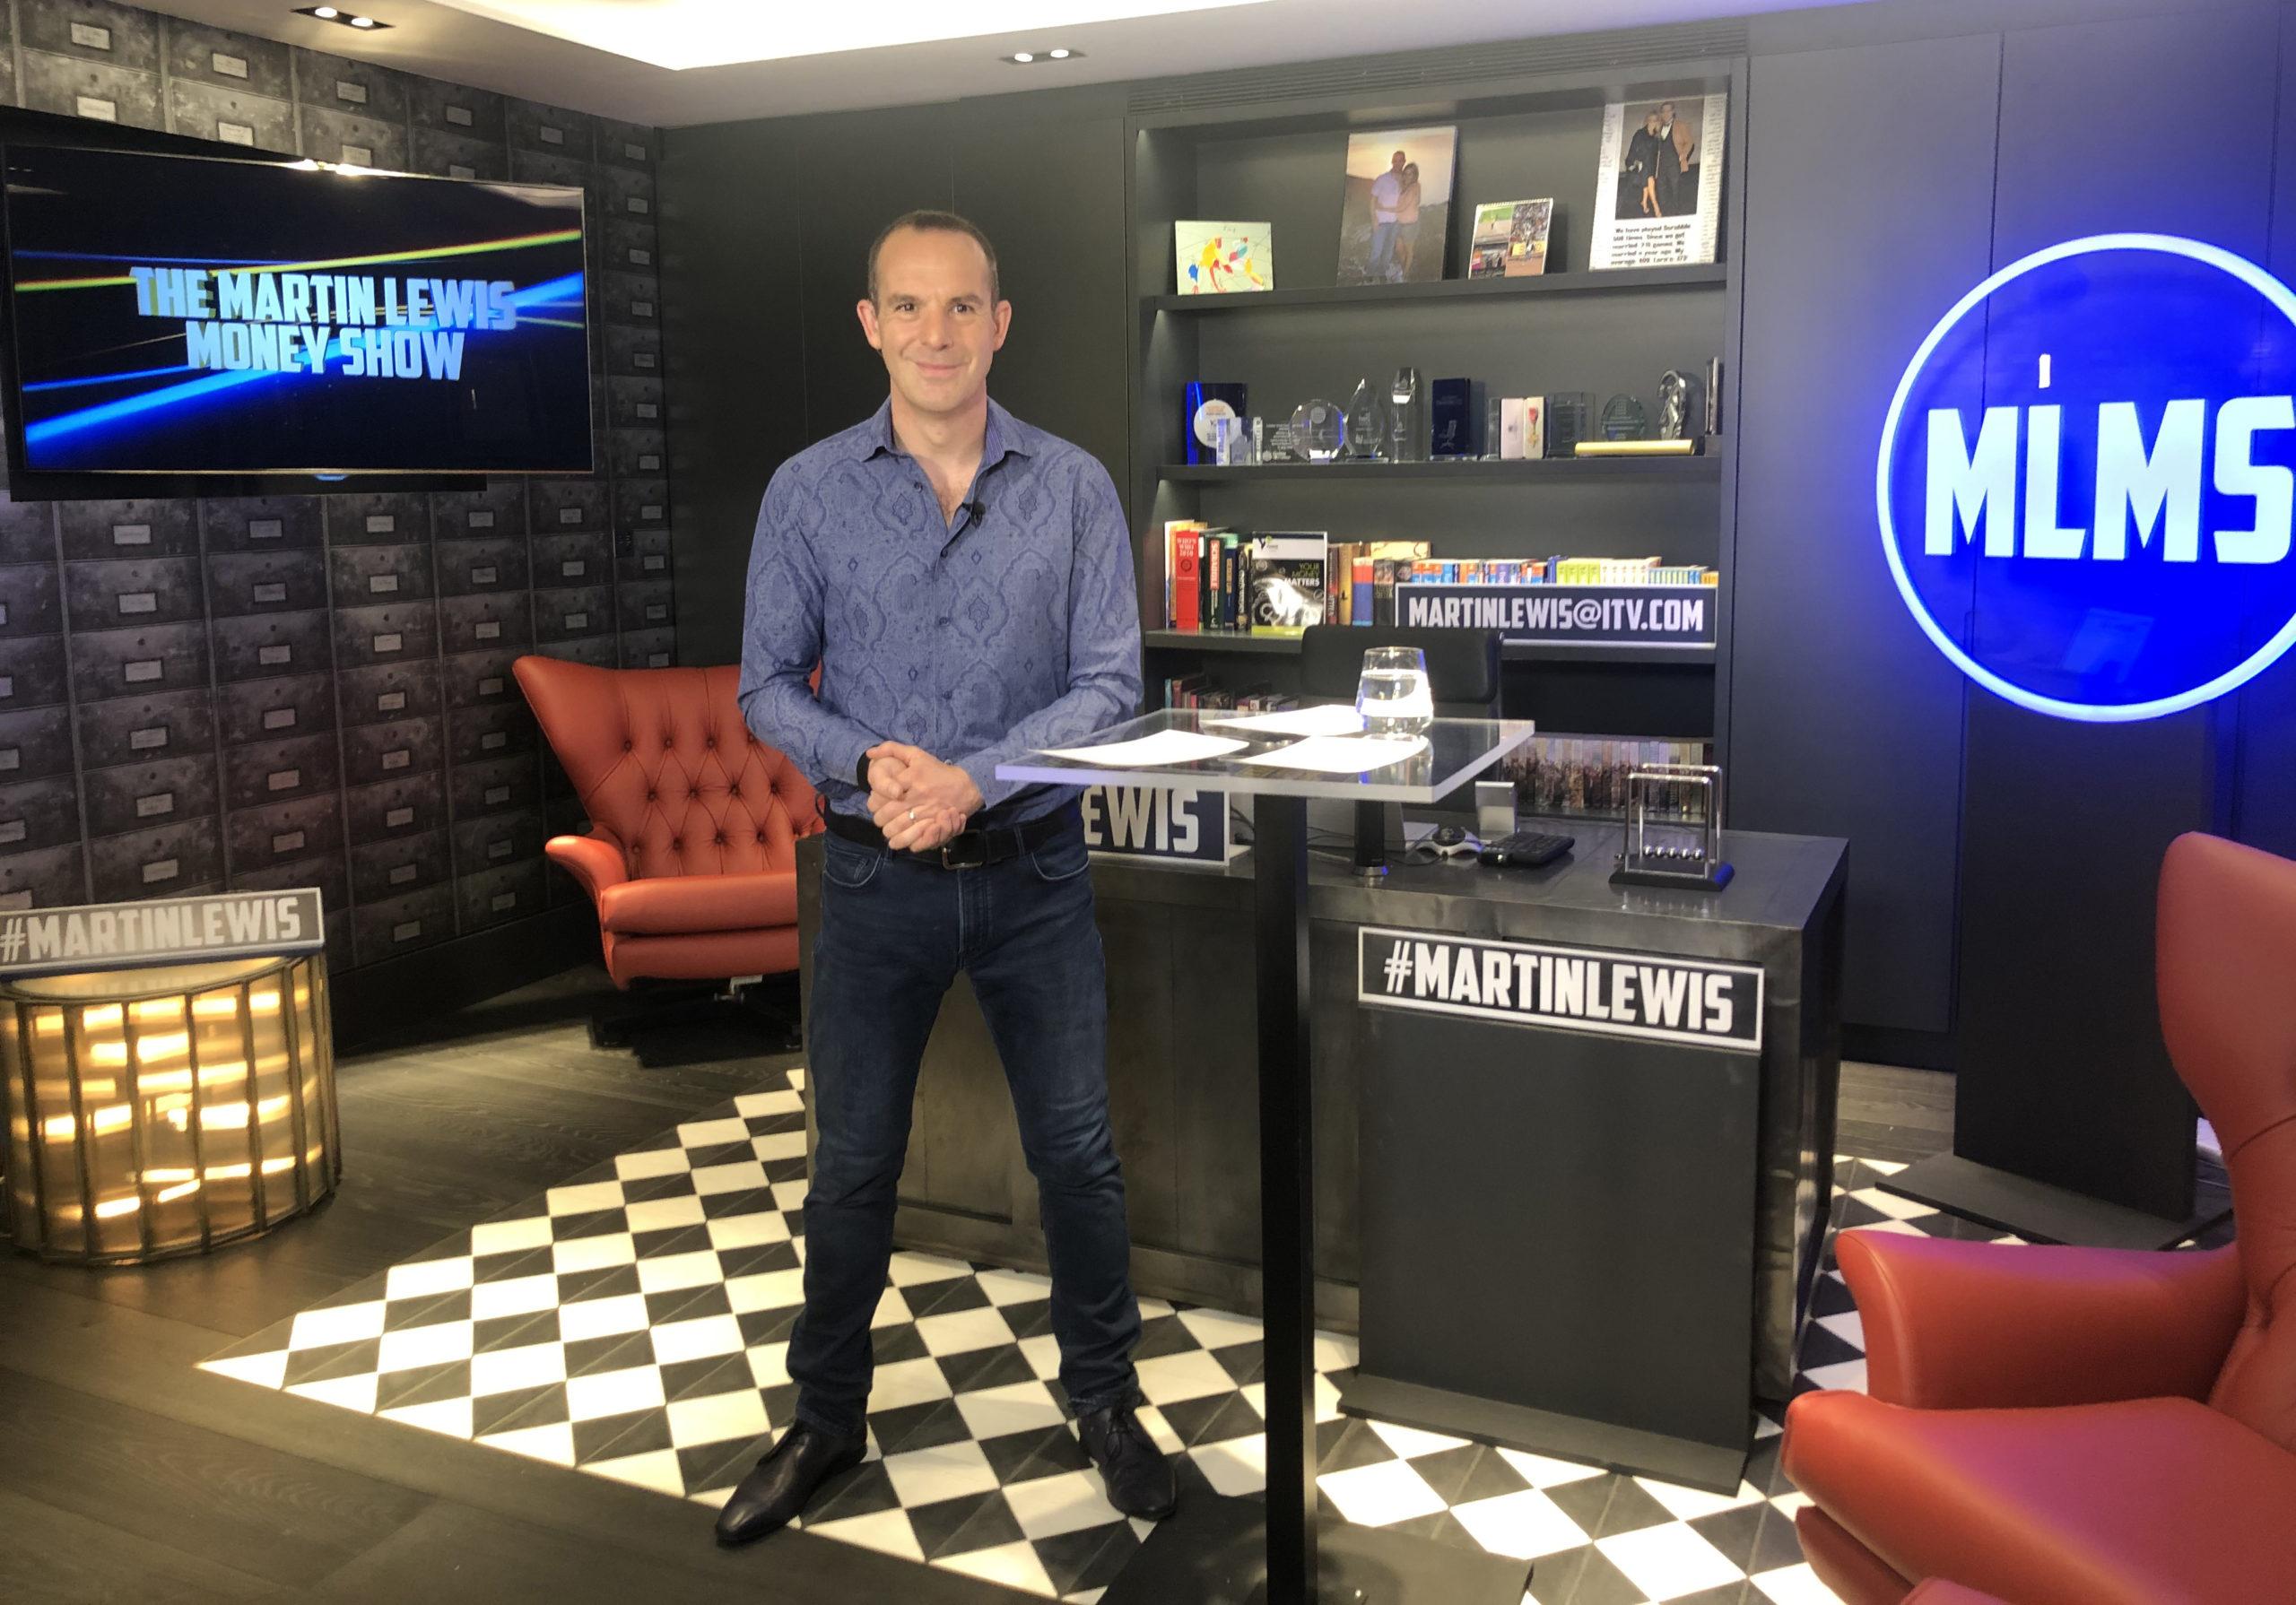 Martin Lewis Money Show ITV